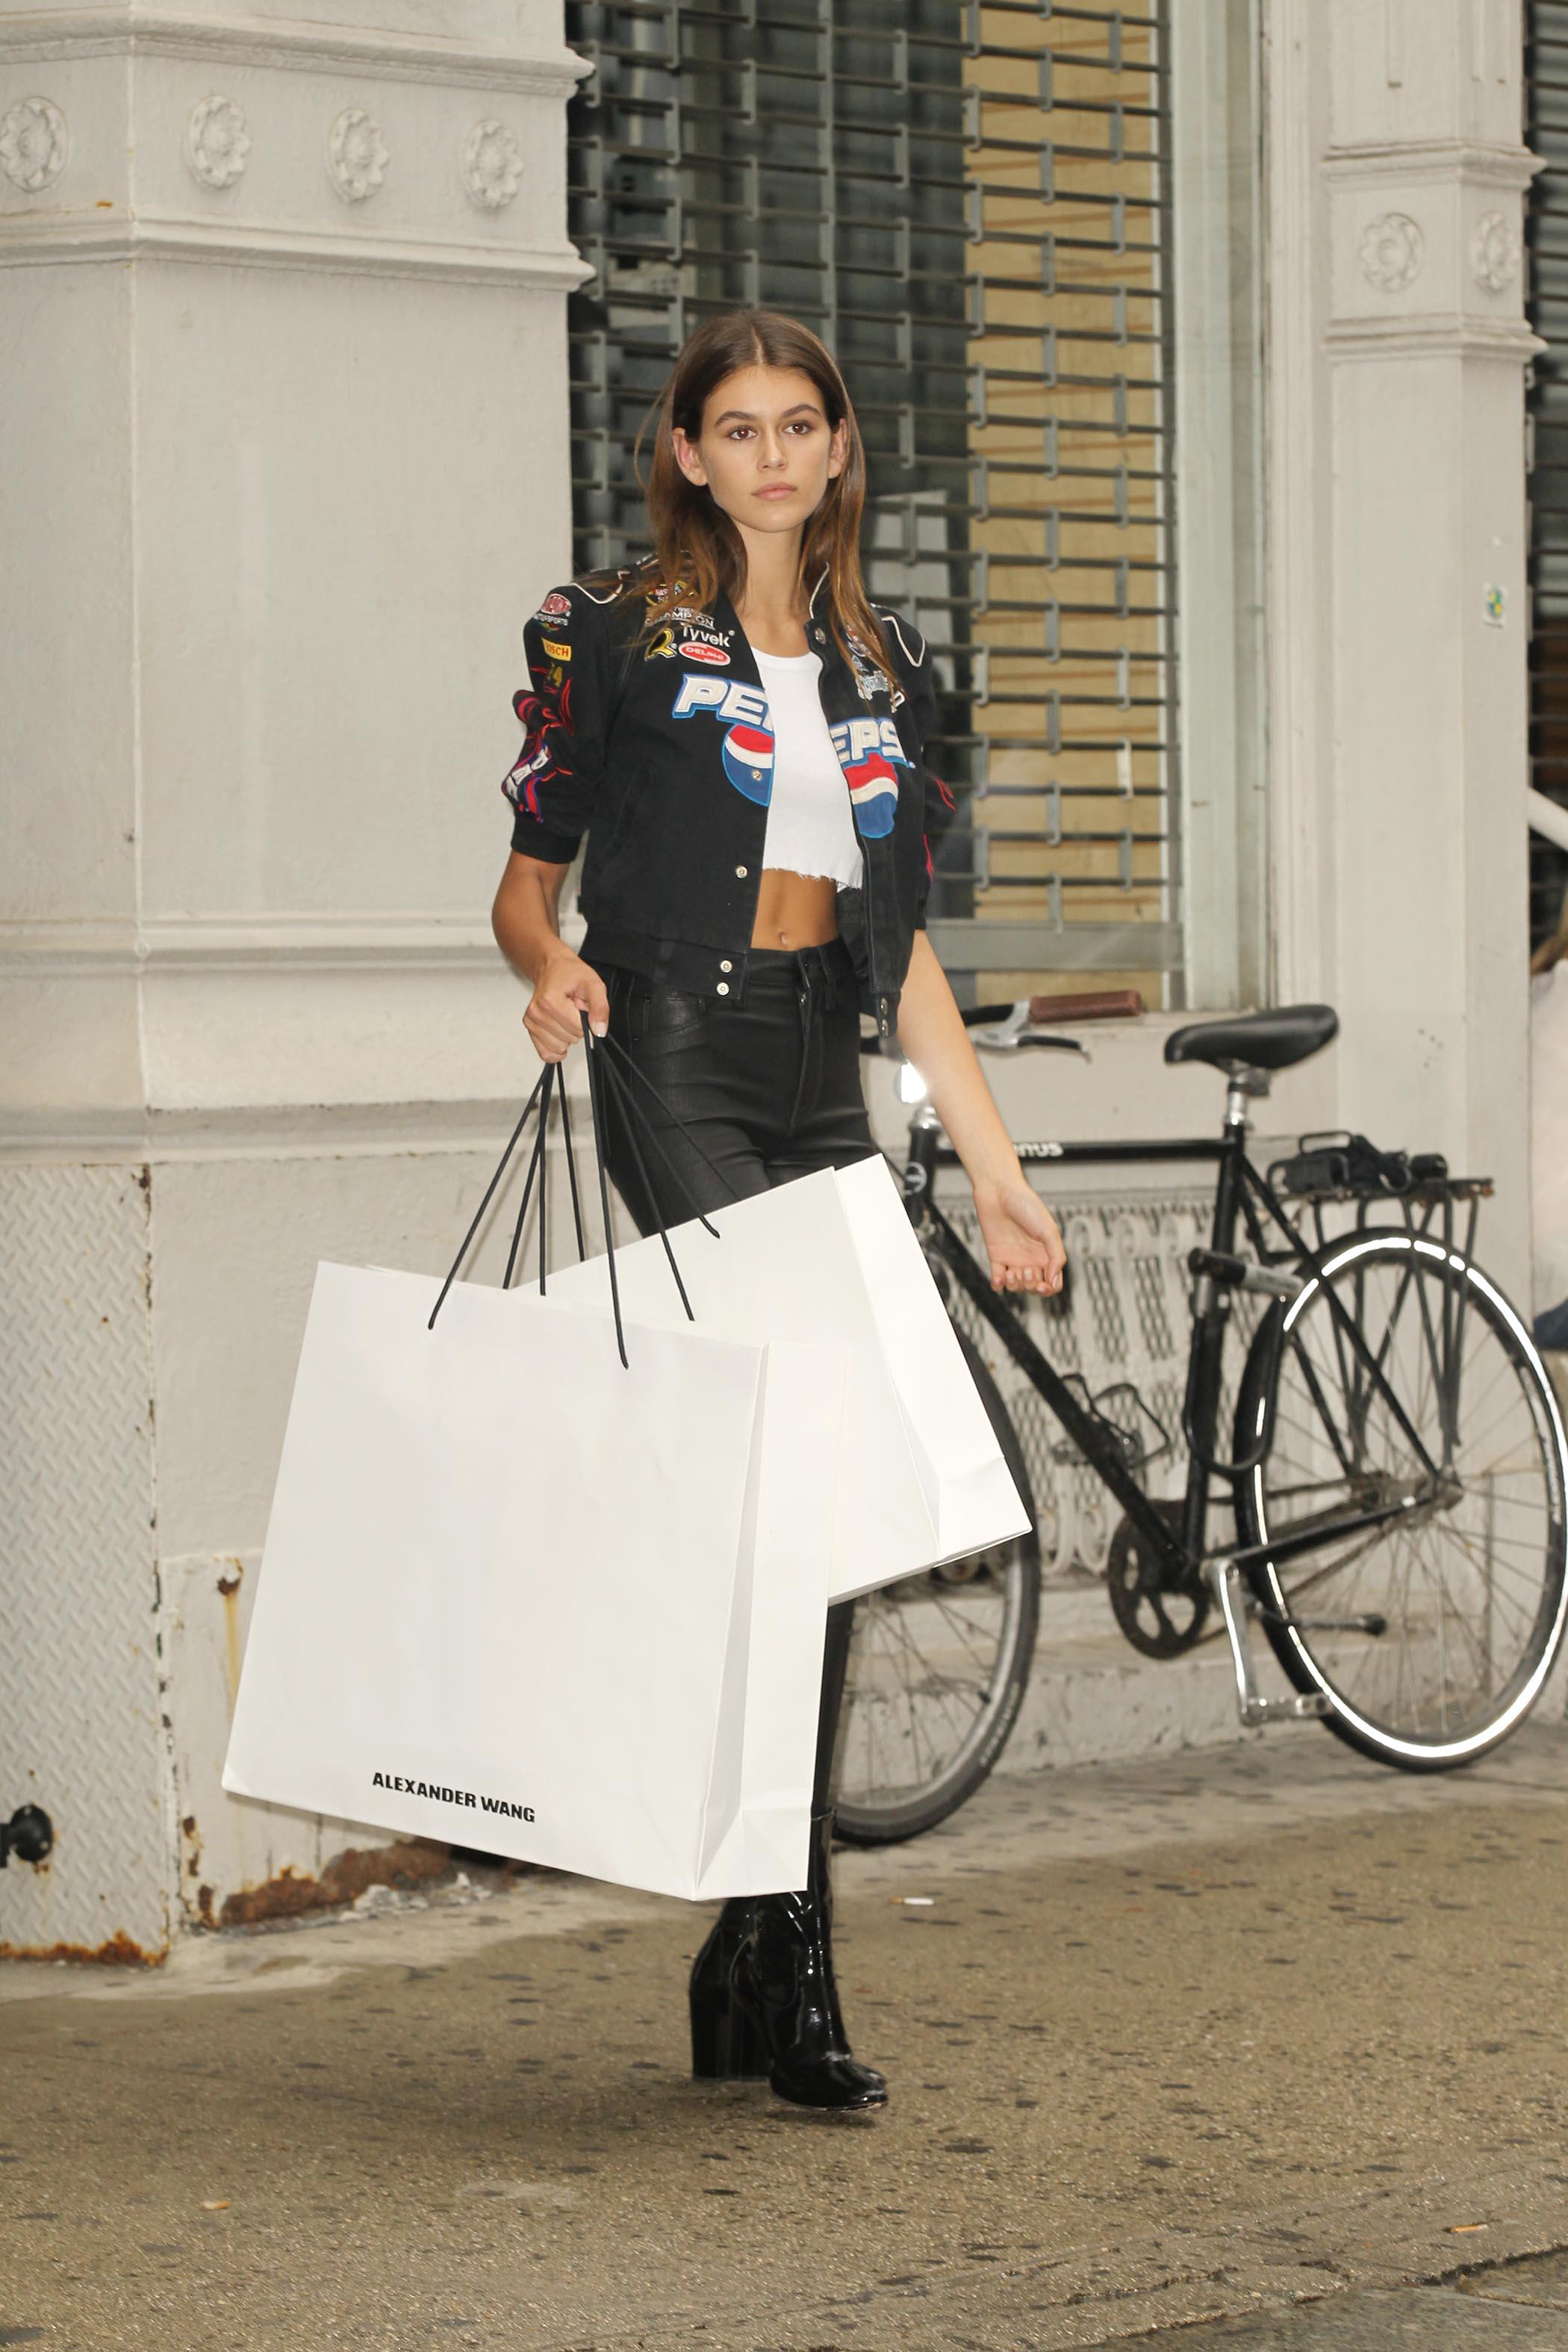 Kaia Gerber seen at the Alexander Wang fitting rooms